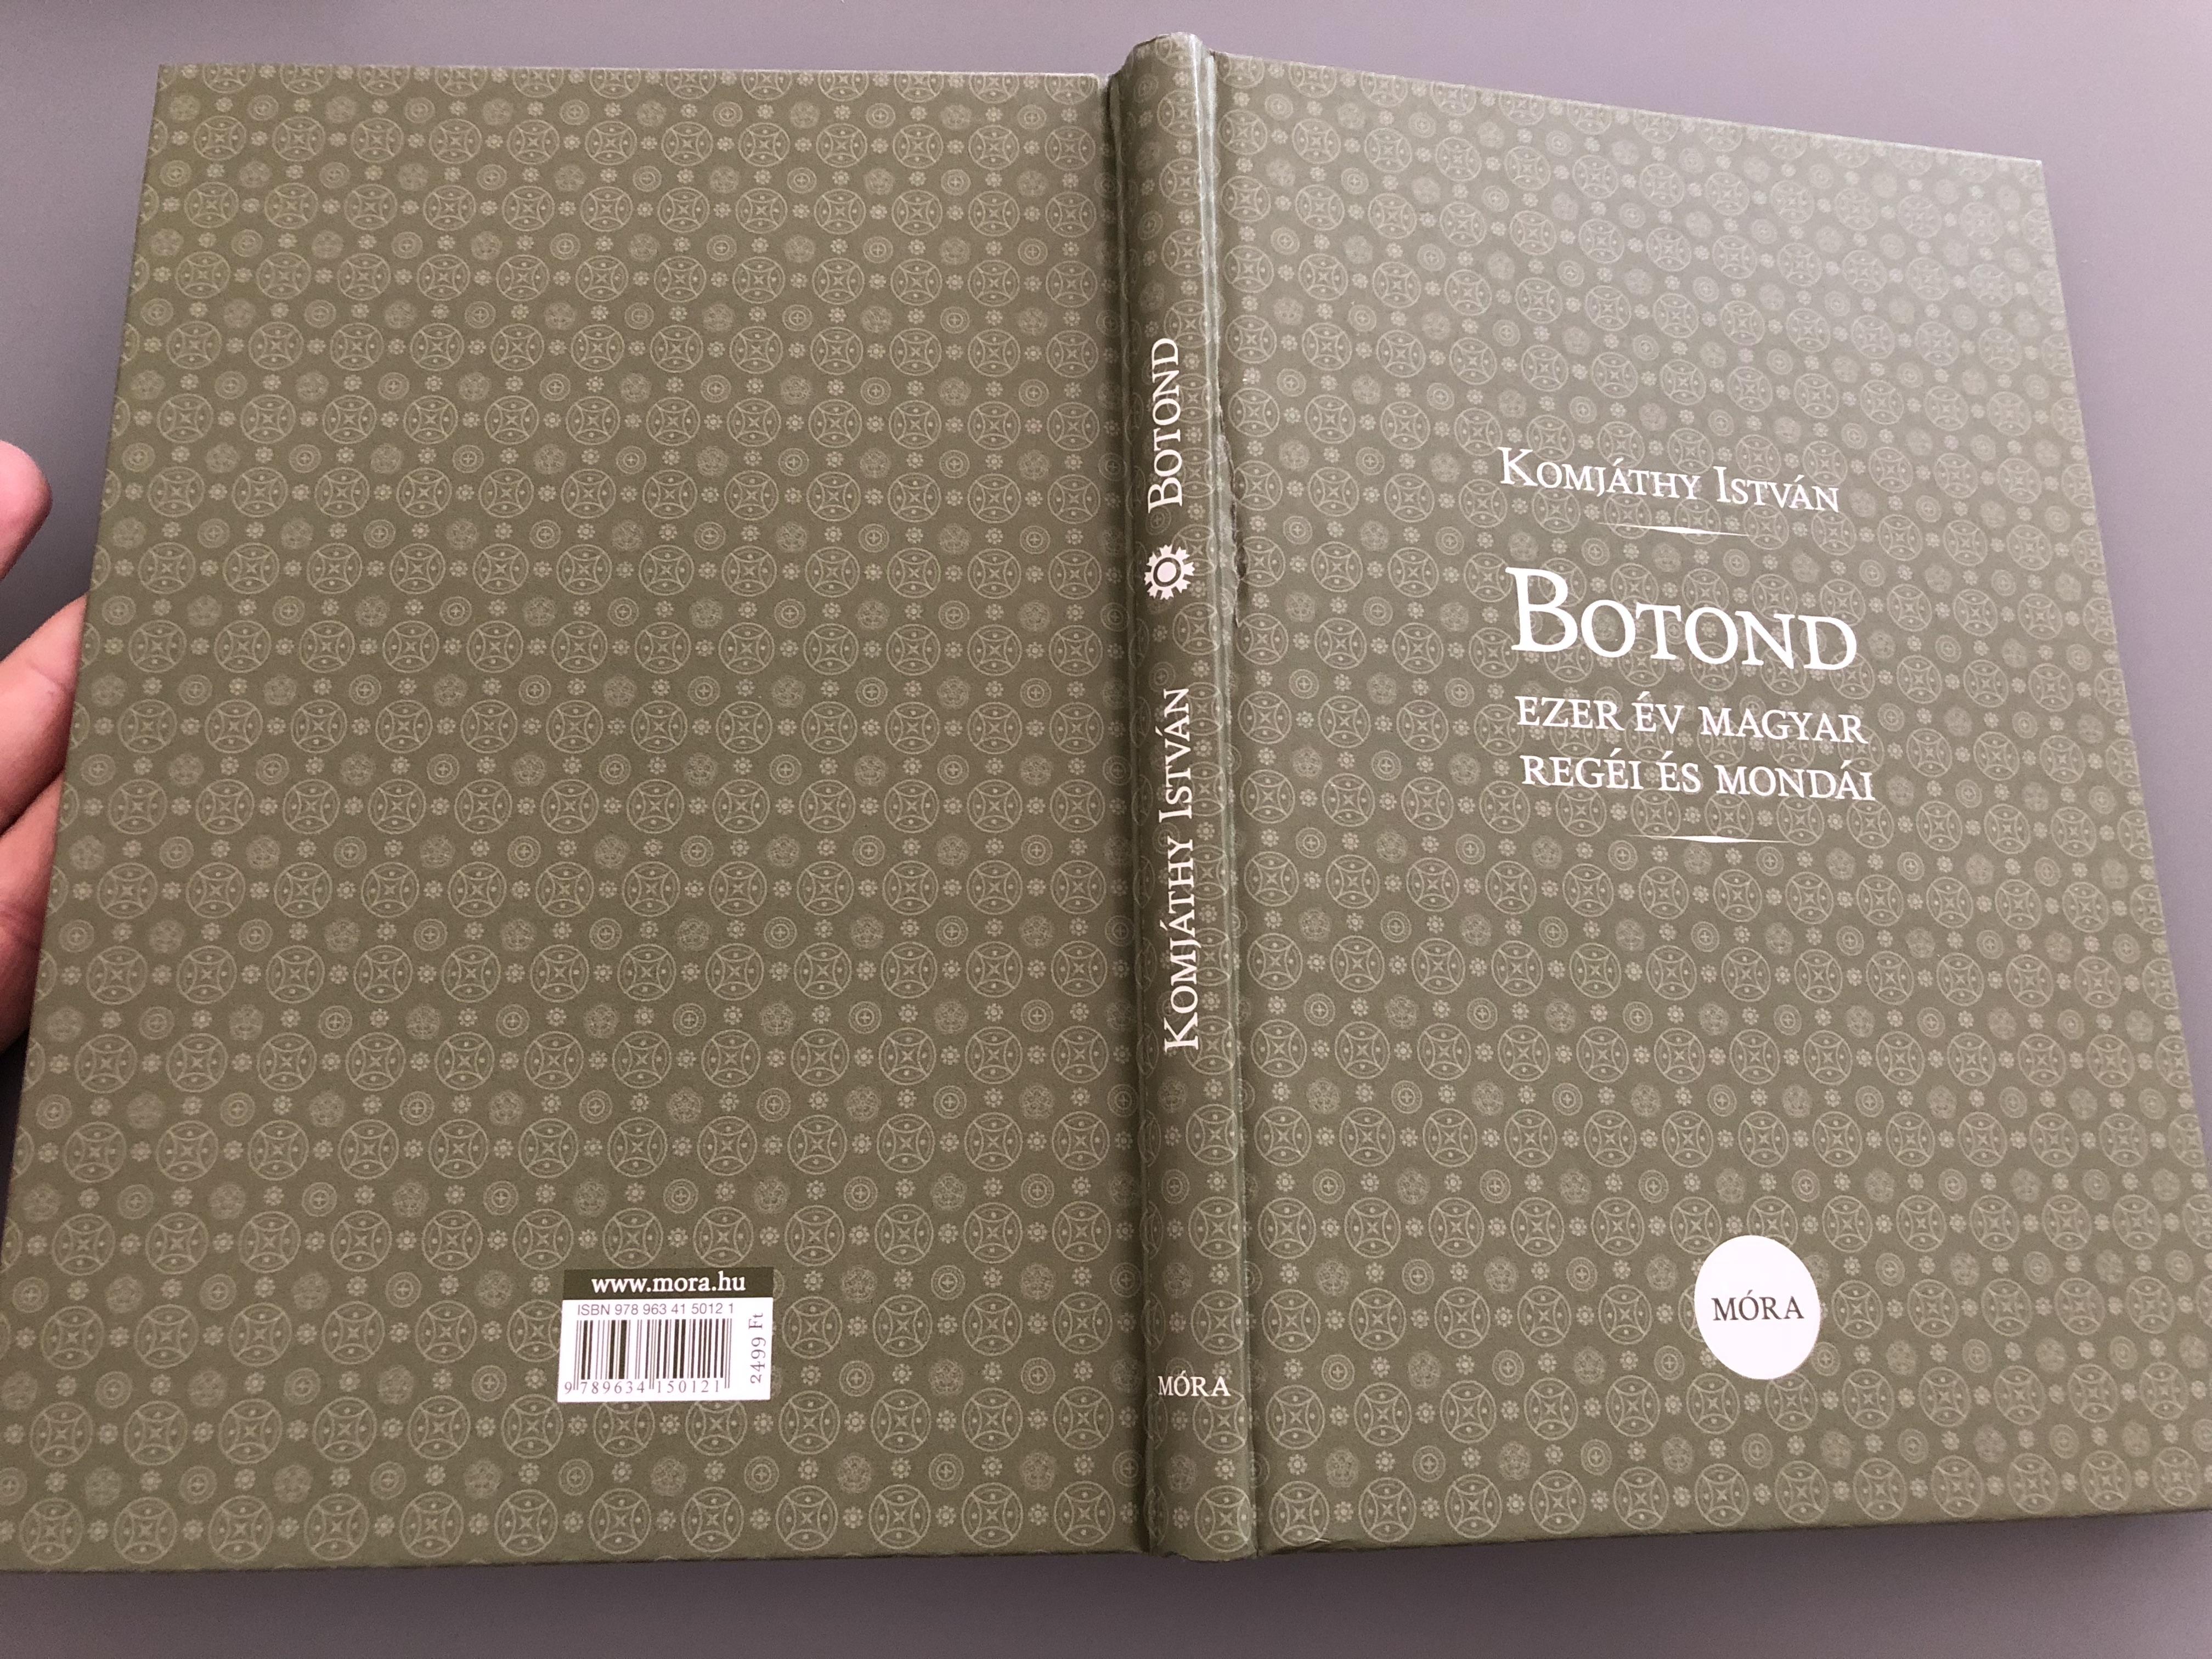 botond-ezer-v-magyar-reg-i-s-mond-i-by-komj-thy-istv-n-a-1000-years-of-hungarian-tales-and-legends-14-.jpg